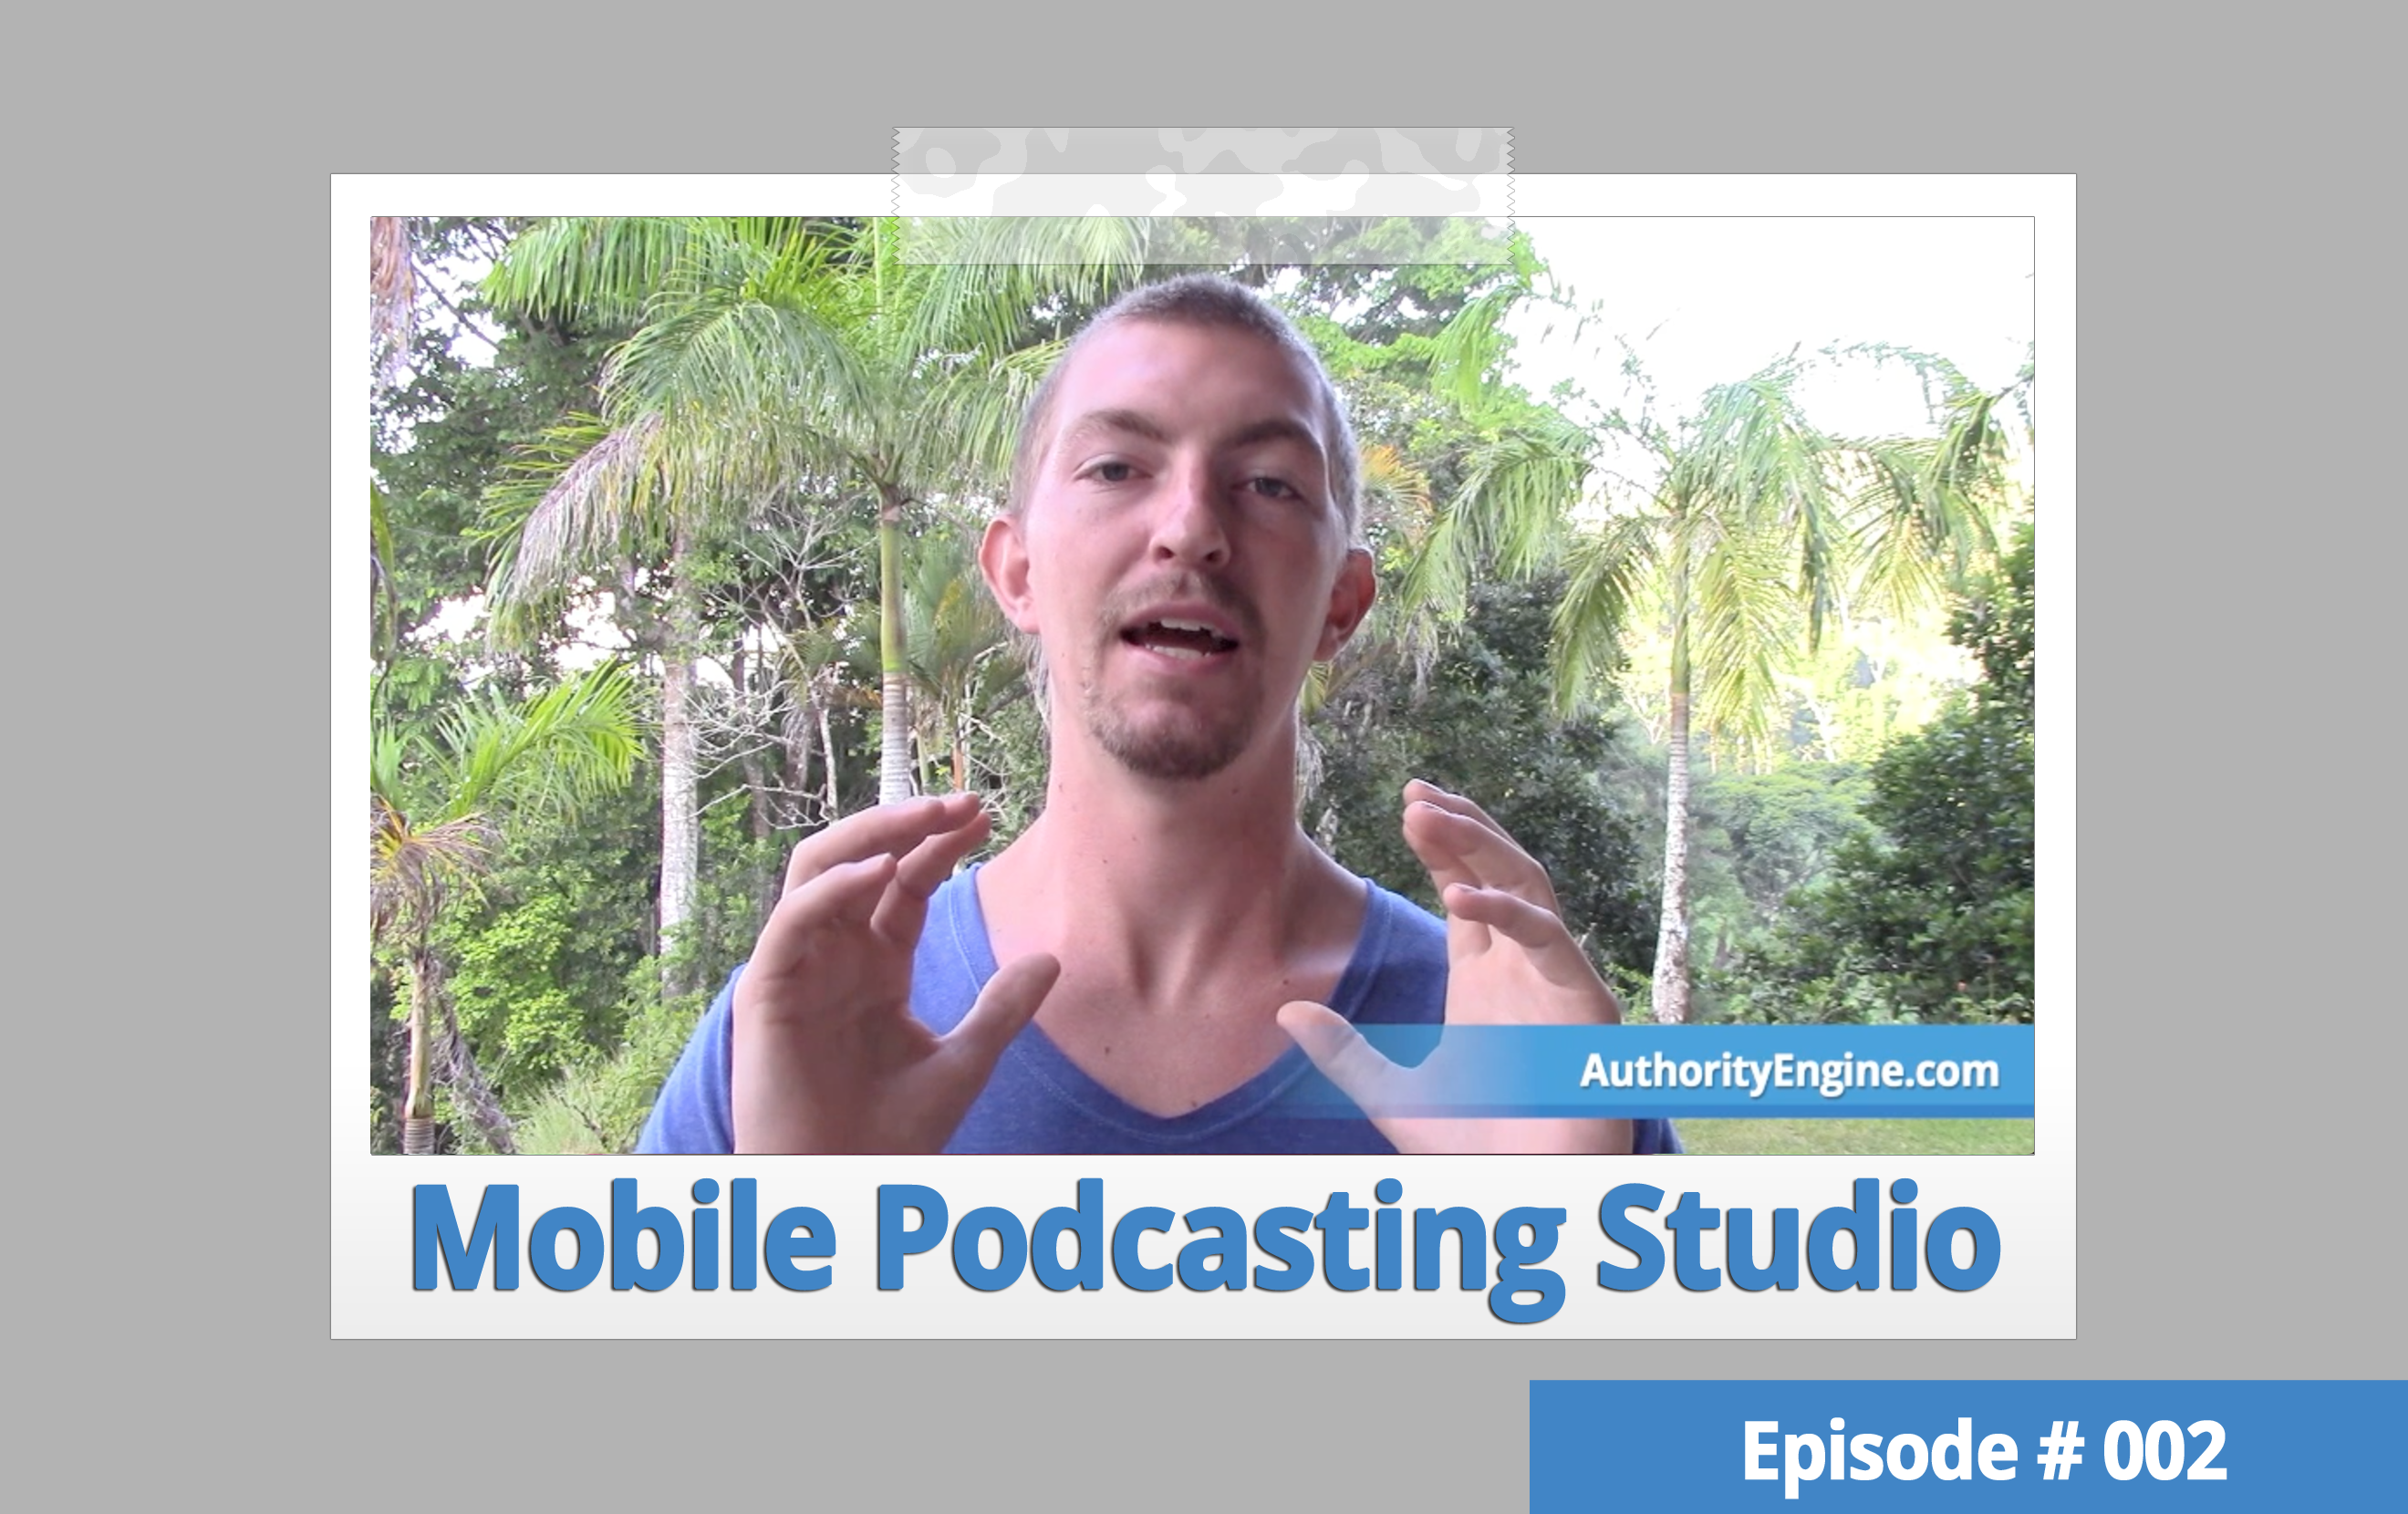 AETV 002: Your Mobile Podcasting Studio